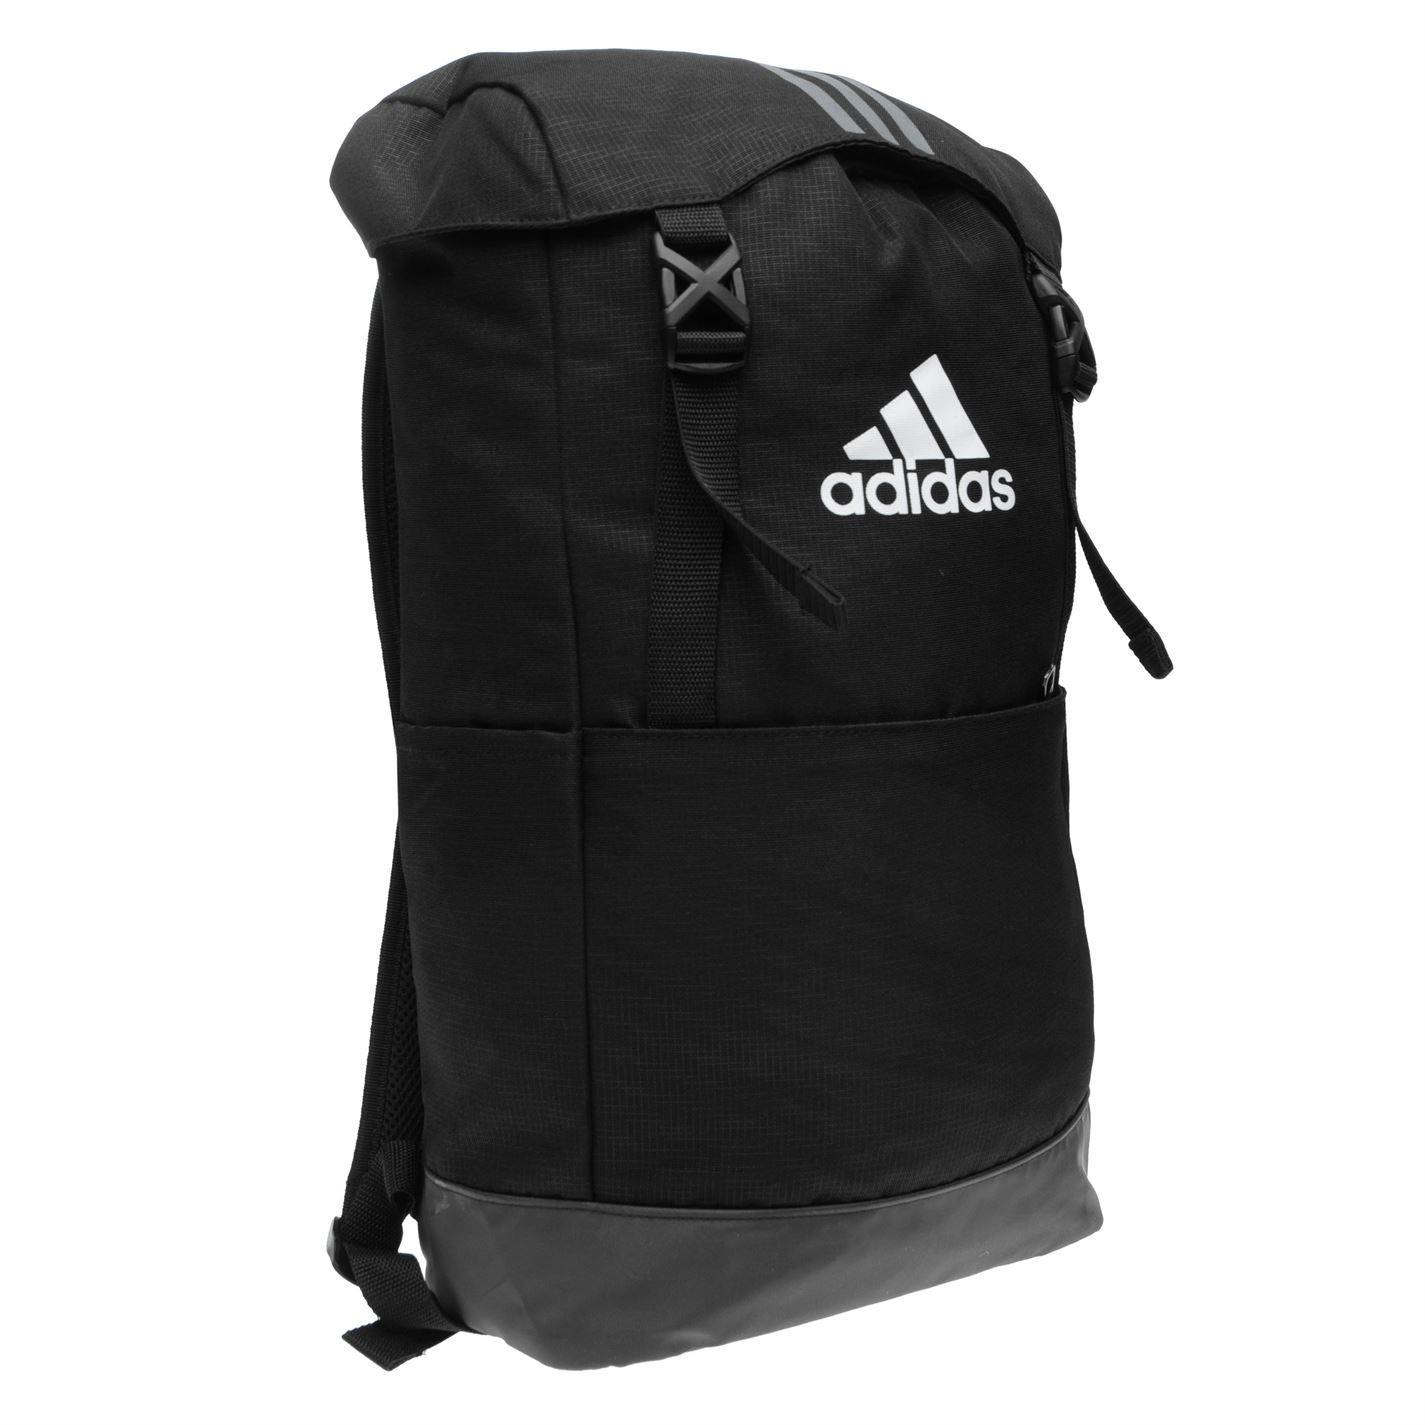 1ebb7728b5d0 ... adidas 3 Stripe Performance Backpack Black Wht Sports Gym Bag Rucksack  Carryall ...